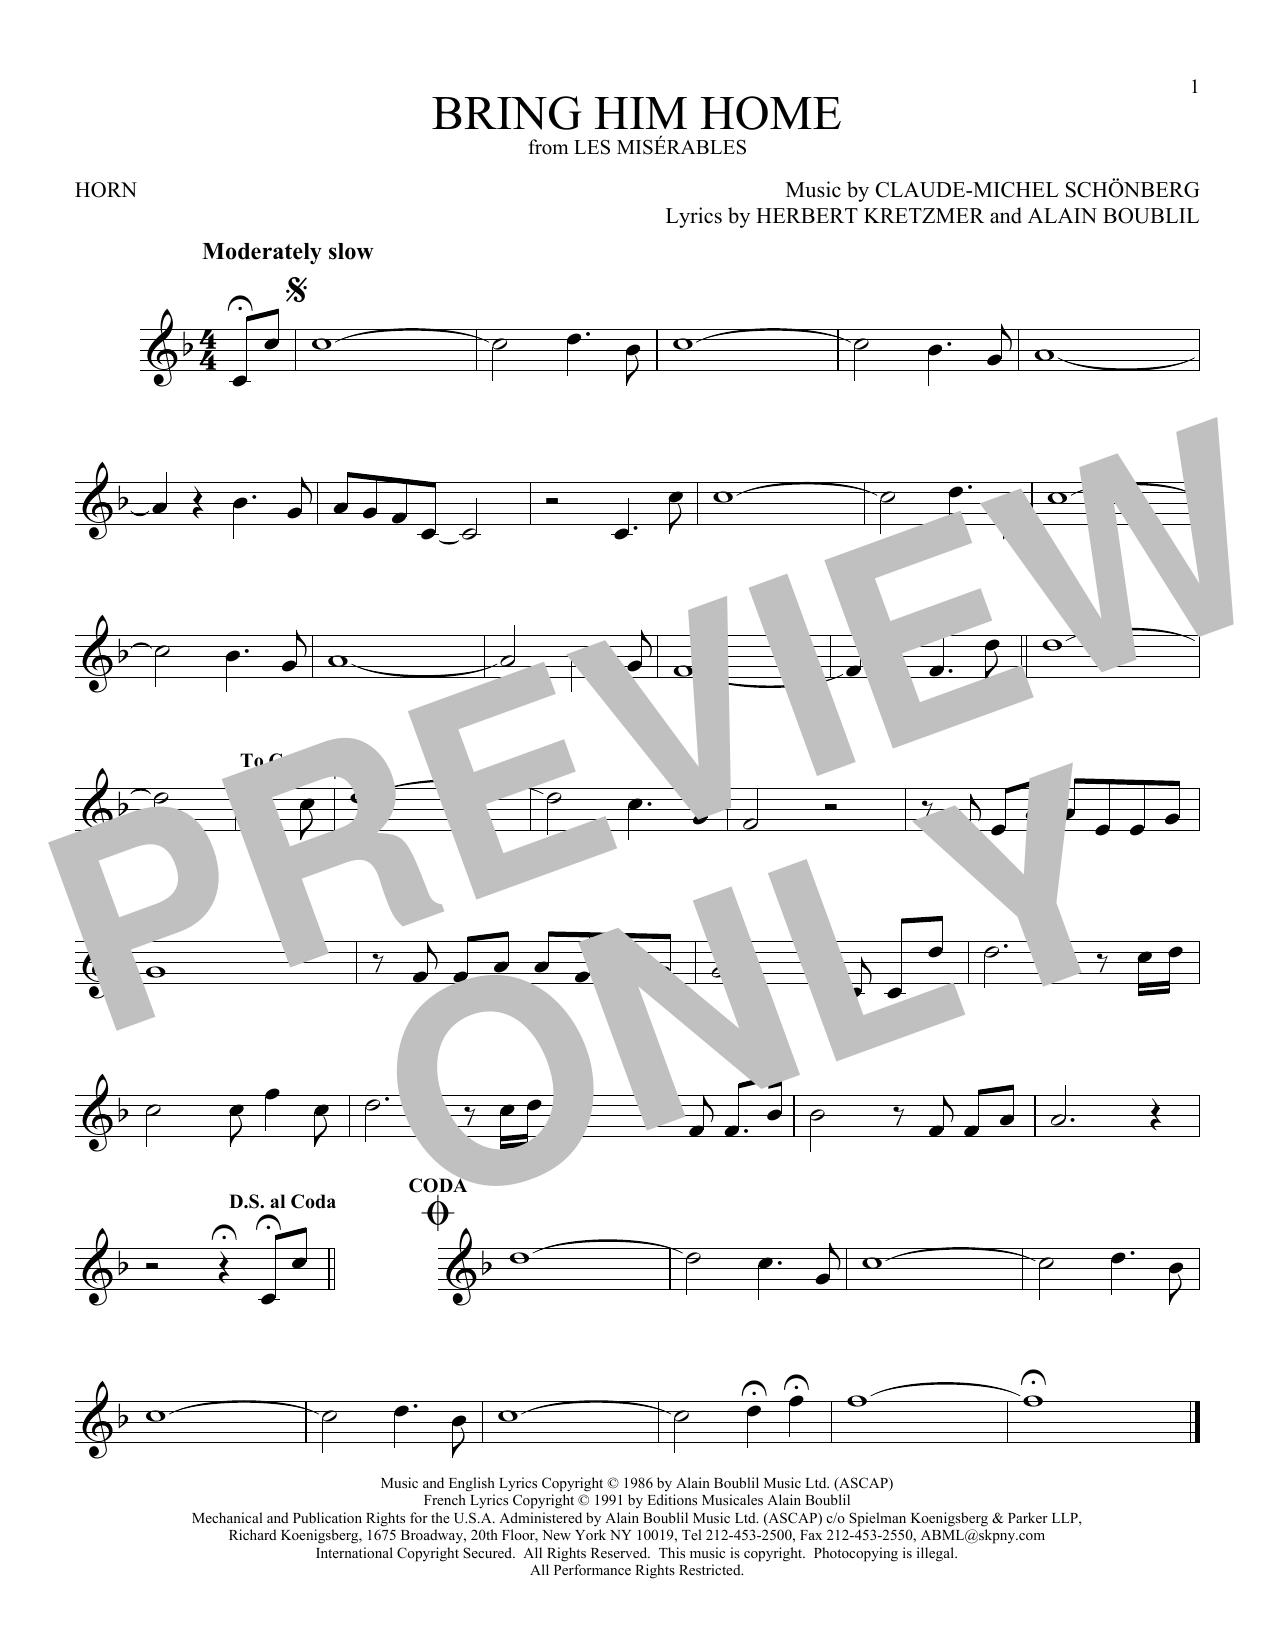 Bring Him Home Sheet Music at Stantons Sheet Music